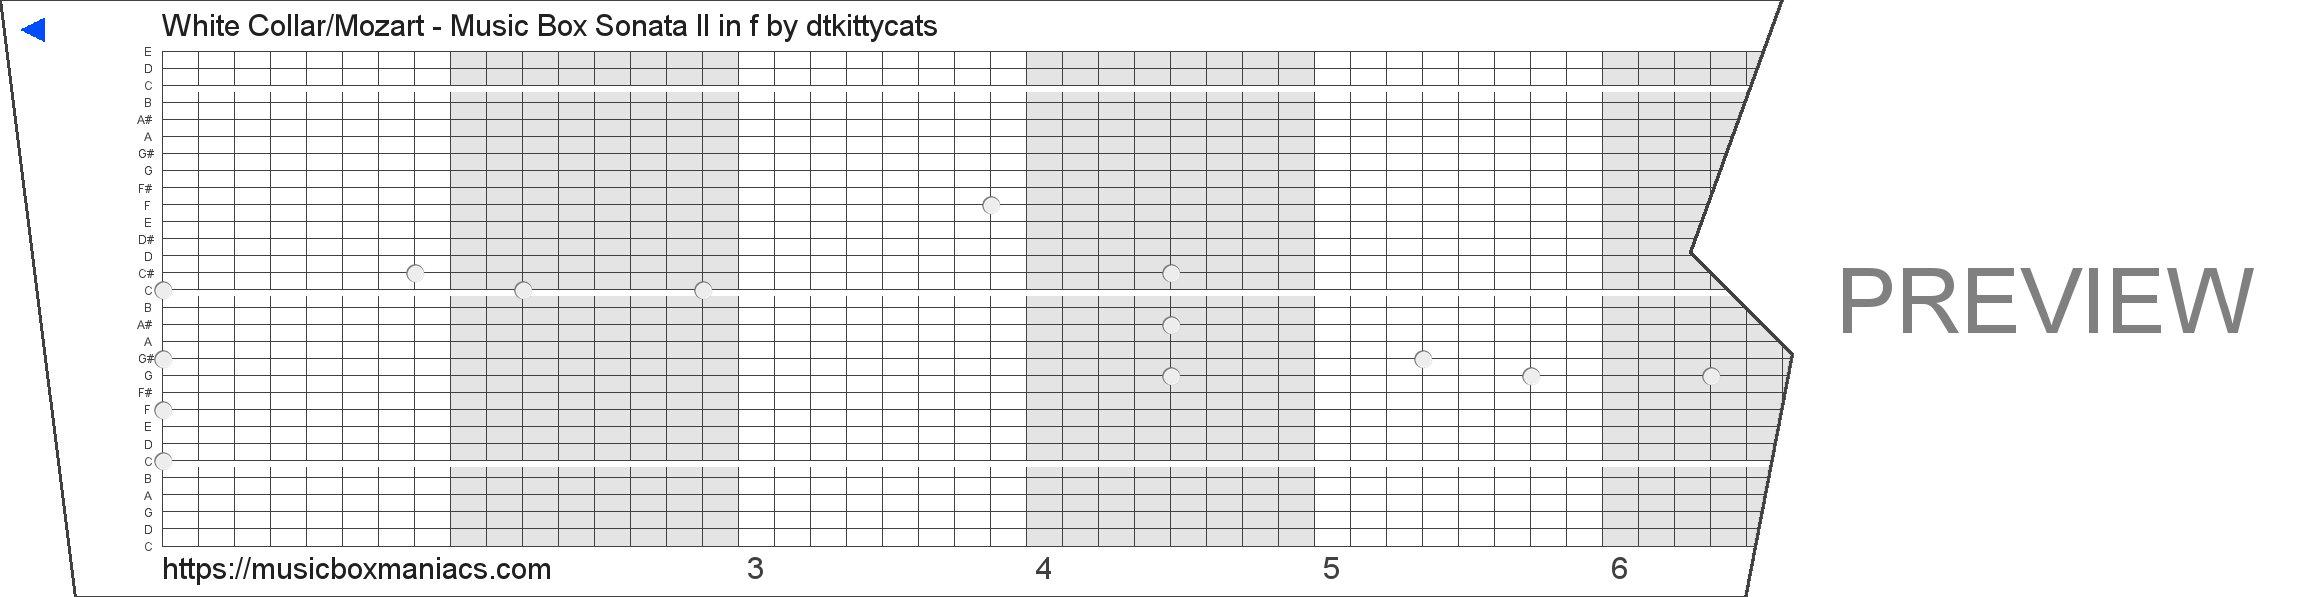 White Collar/Mozart - Music Box Sonata II in f 30 note music box paper strip